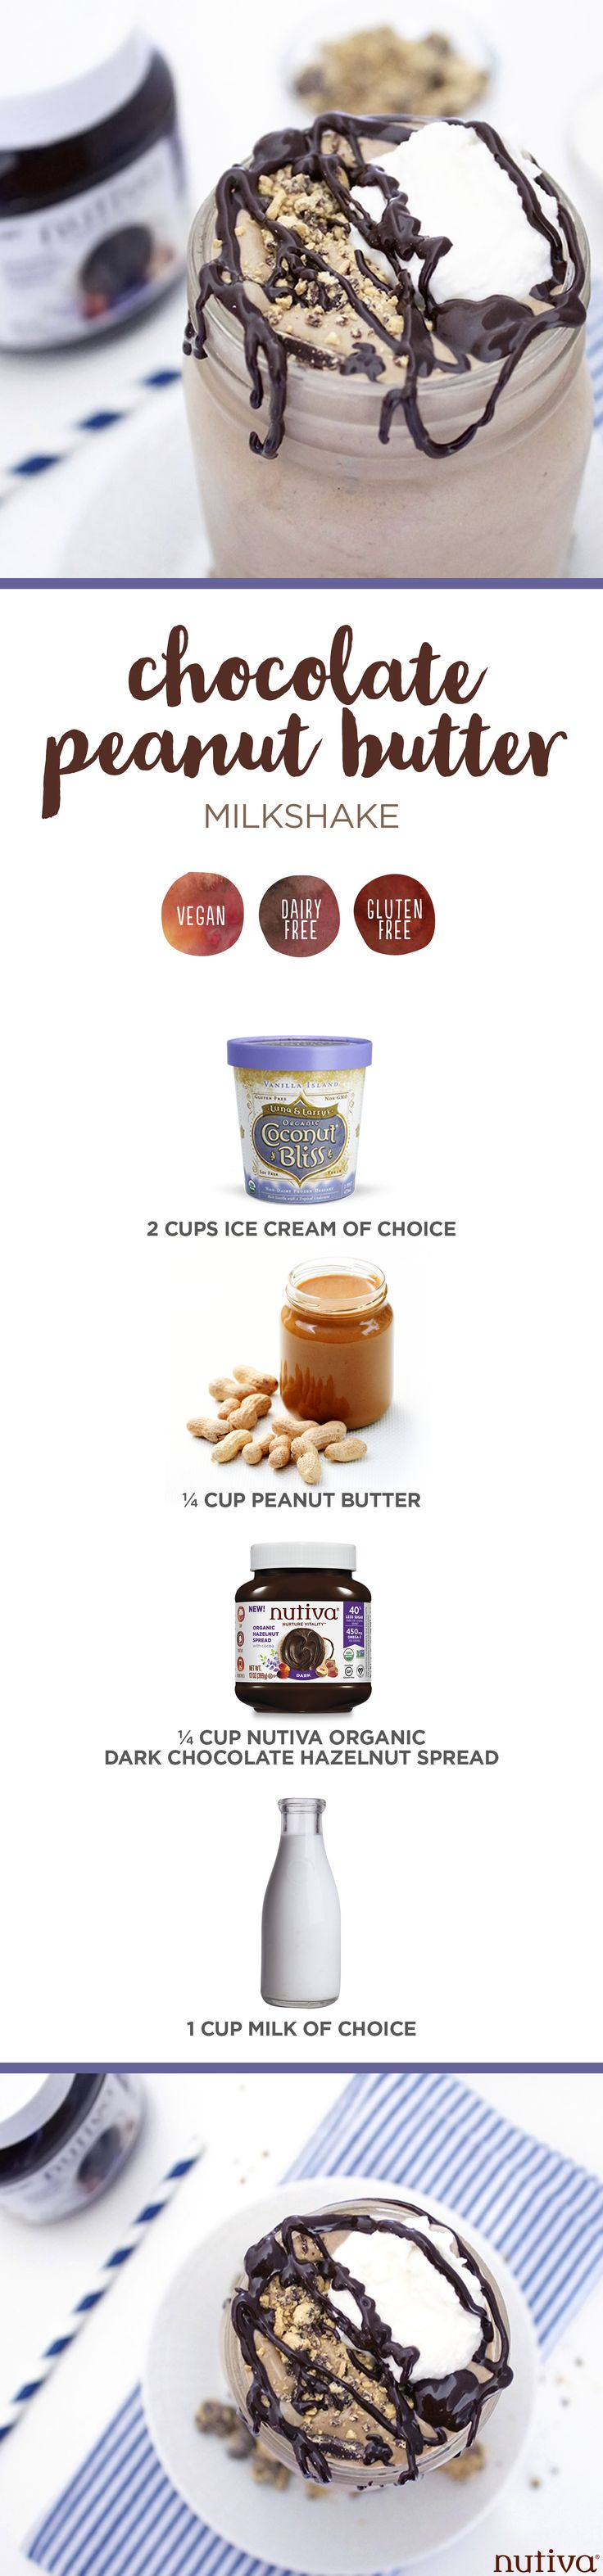 Chocolate Peanut Butter Milkshake kitchen.nutiva.com Nutiva Organic Vegan Ingredients